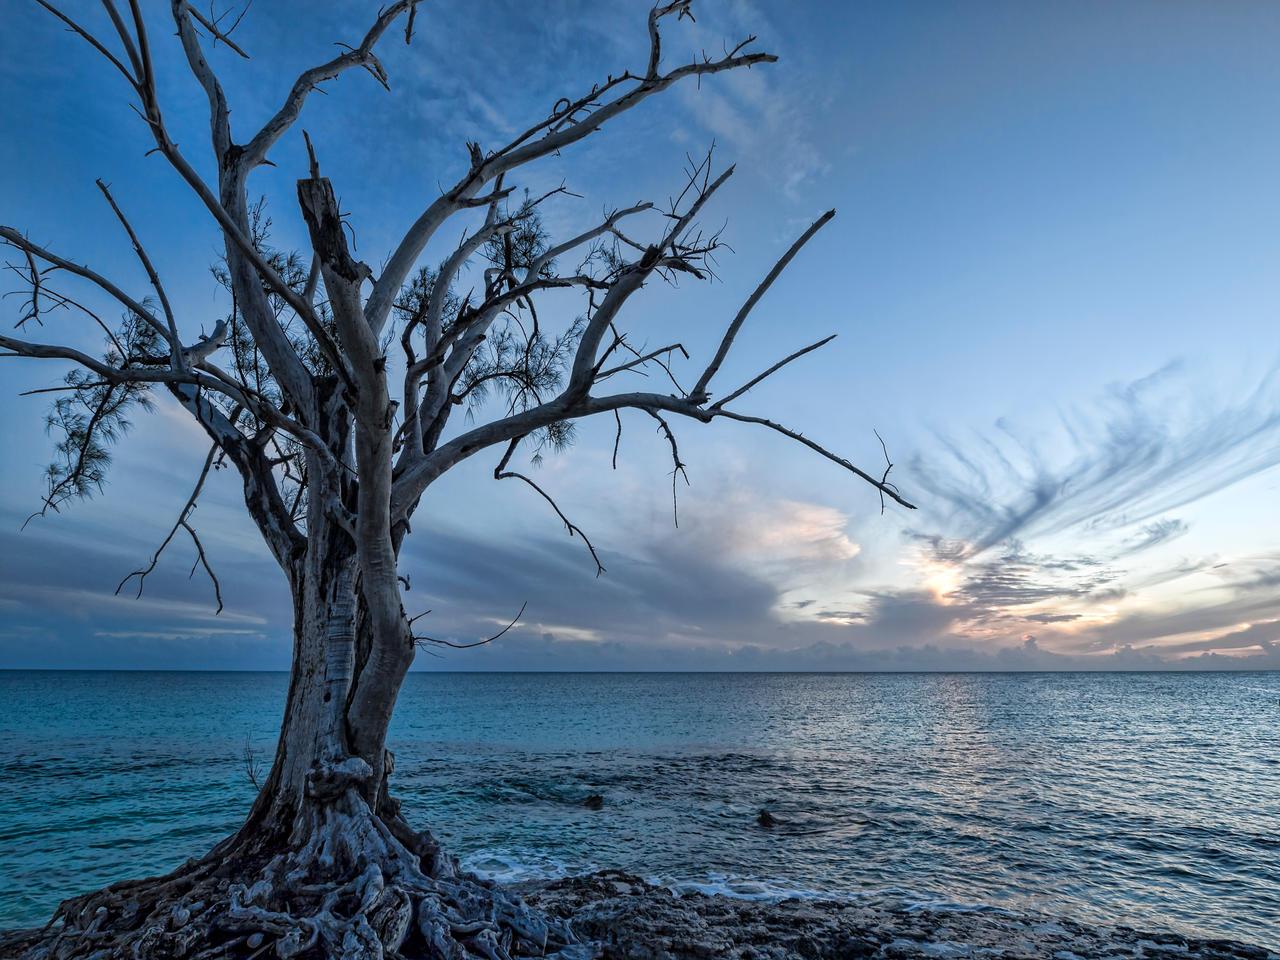 Spooky tree sunset by peterpateman